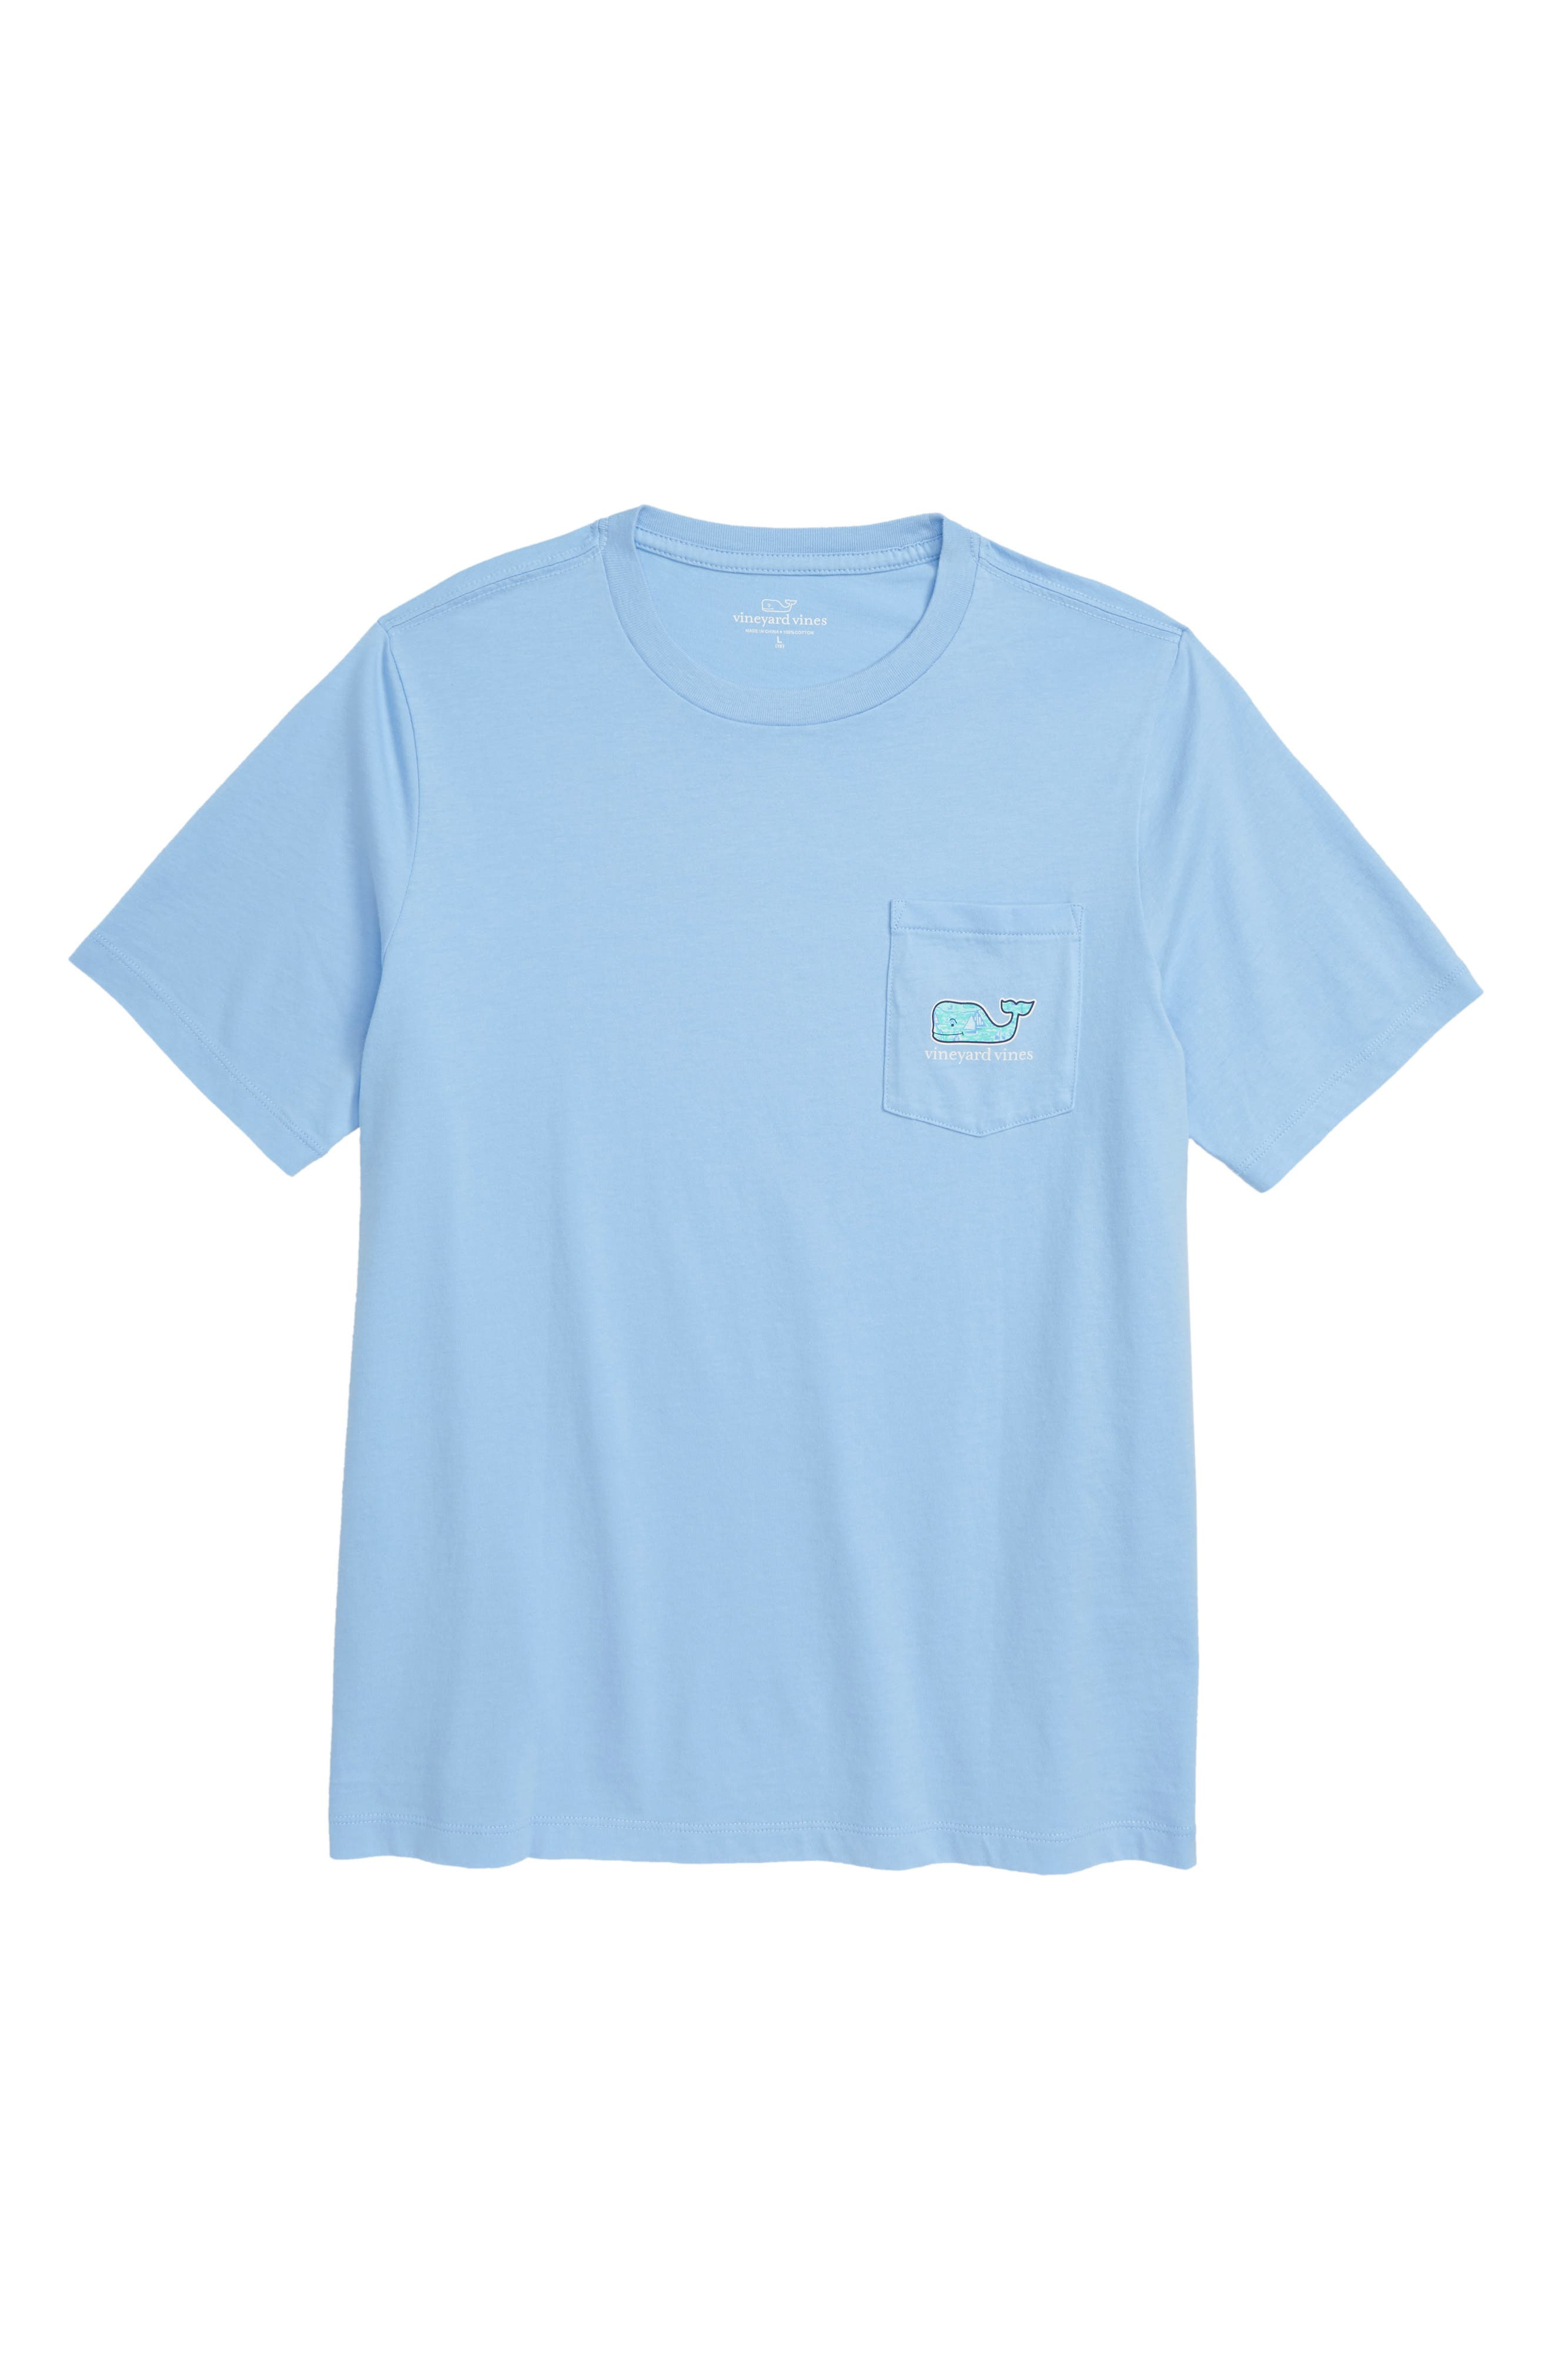 Sailing the Vineyard Whale Pocket T-Shirt,                         Main,                         color, 456